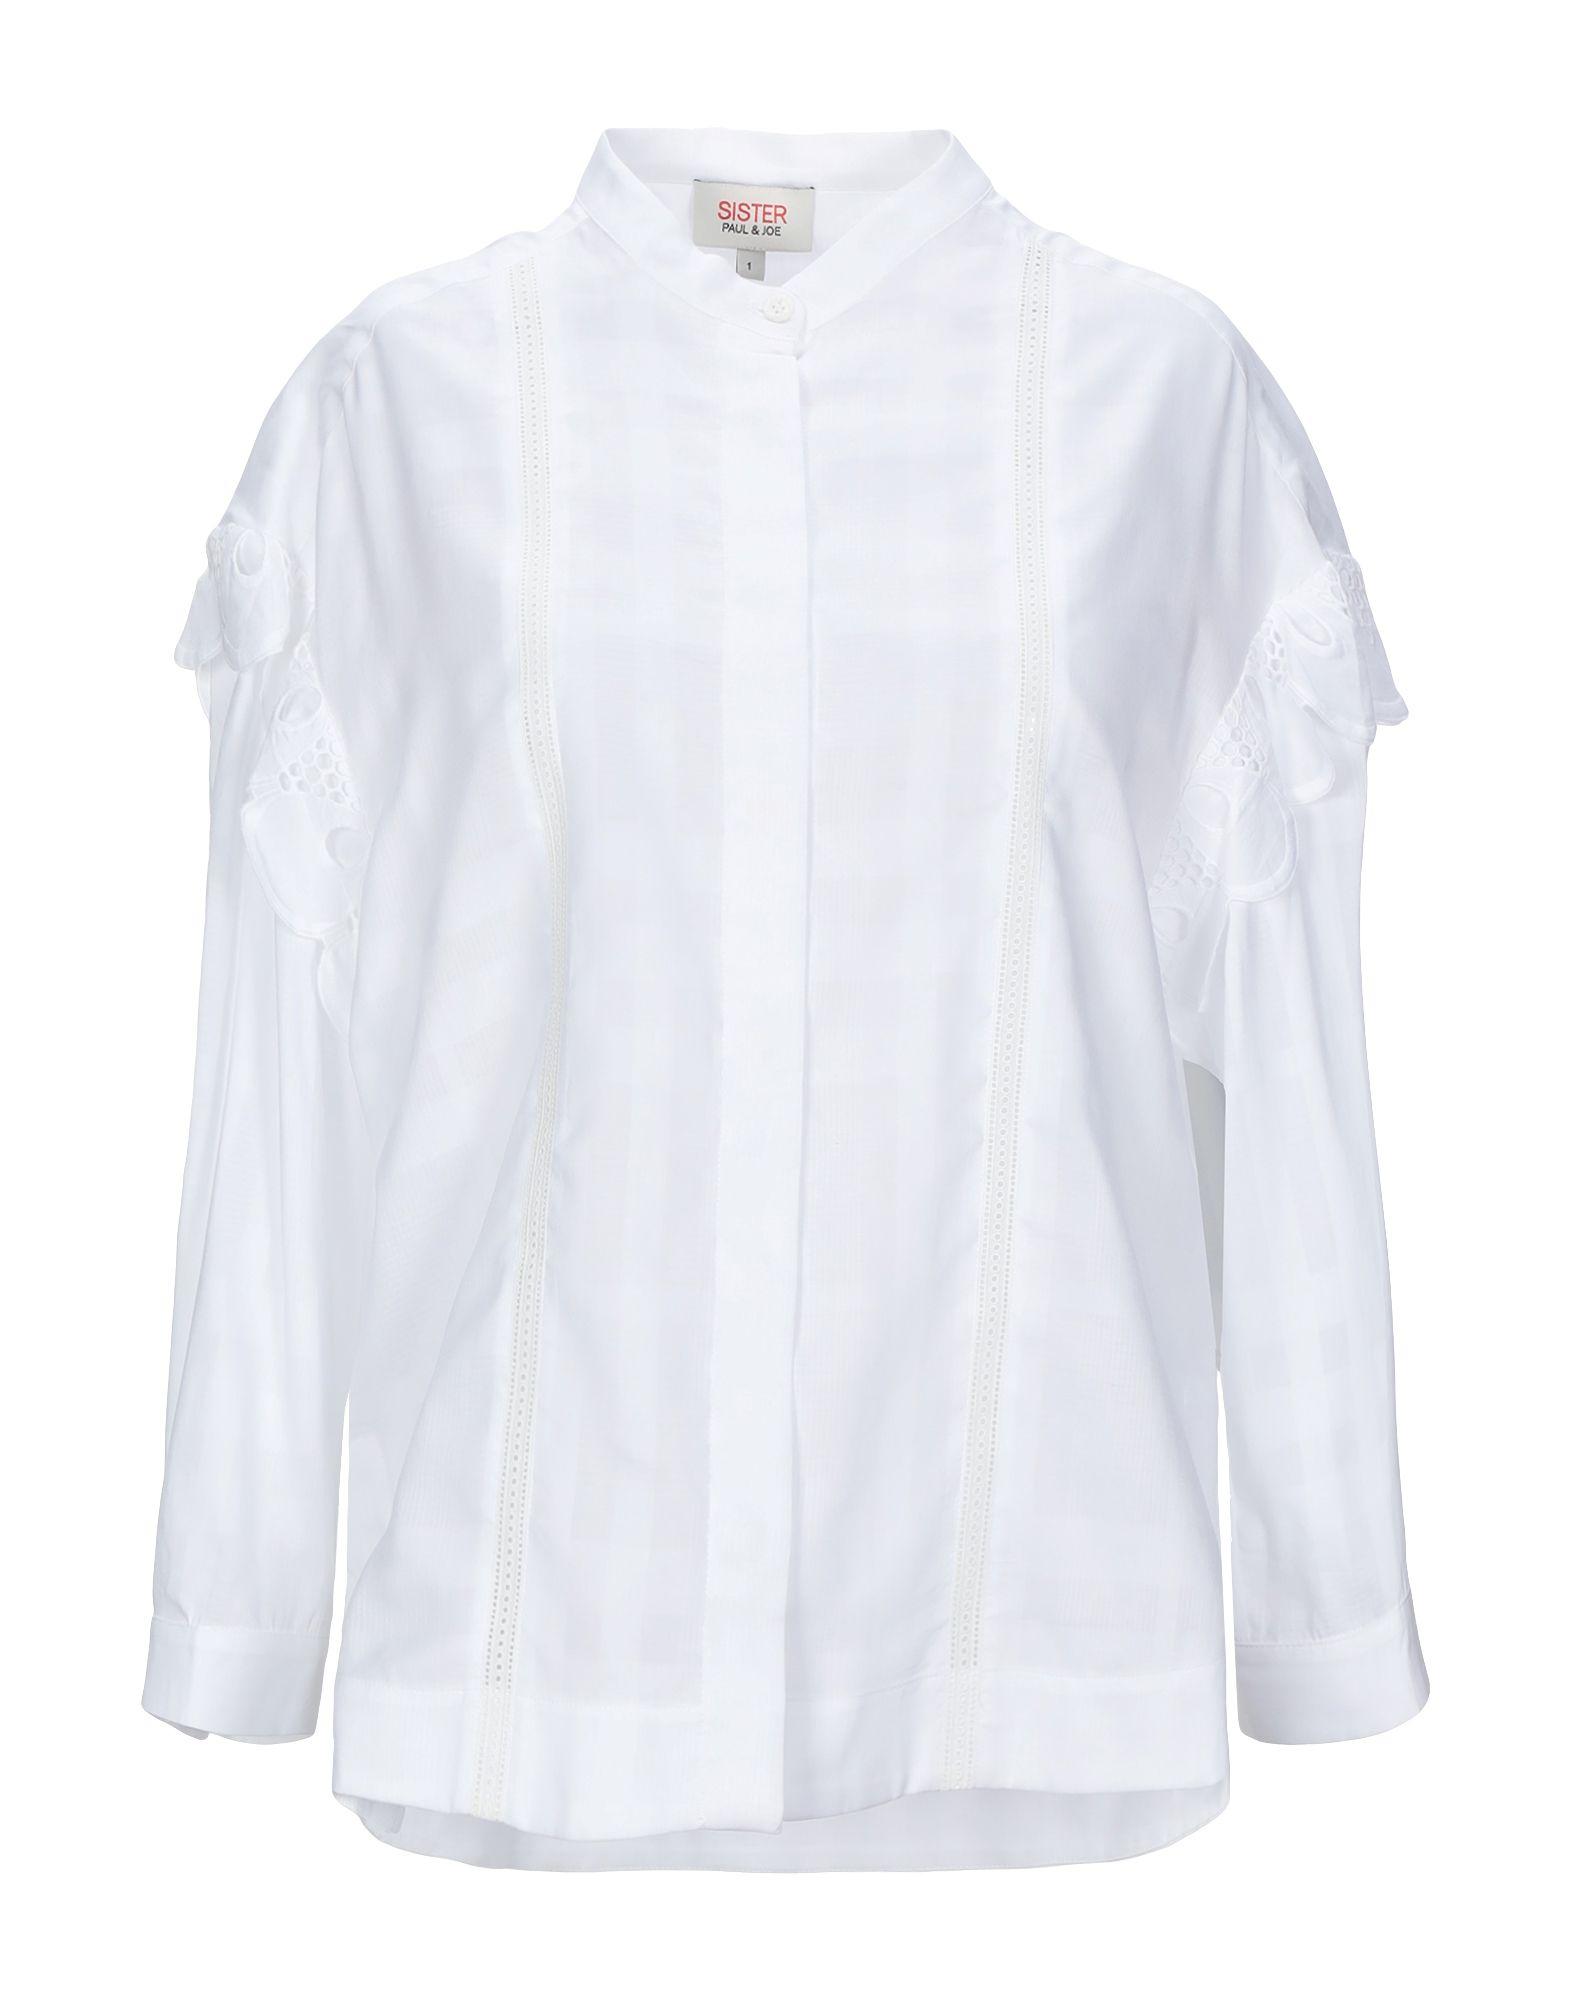 PAUL & JOE SISTER Pубашка joe barret firenze pубашка